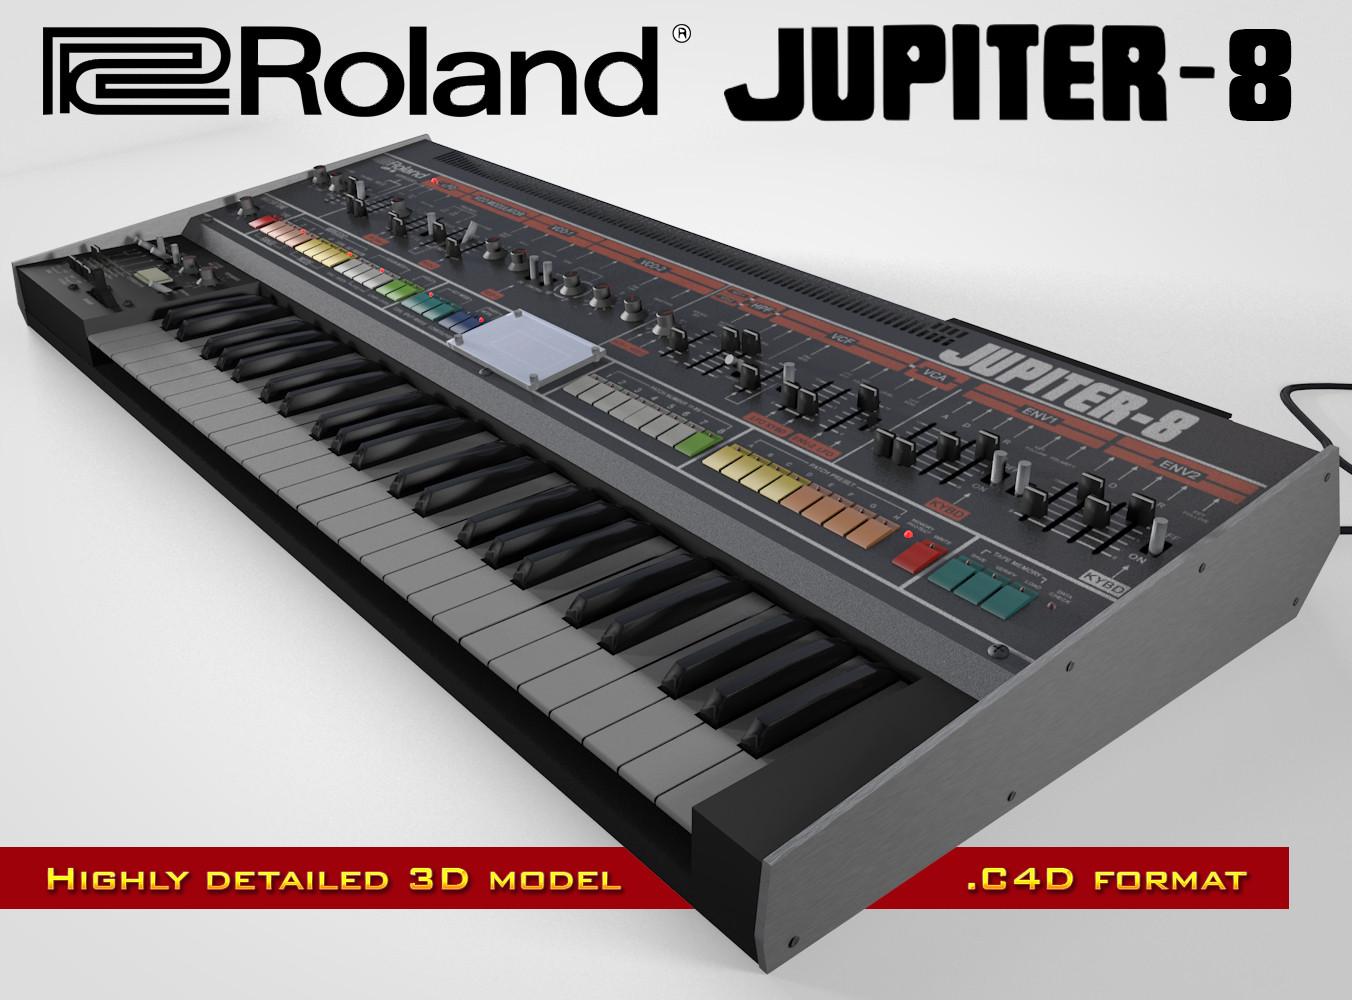 roland jupiter-8 c4d